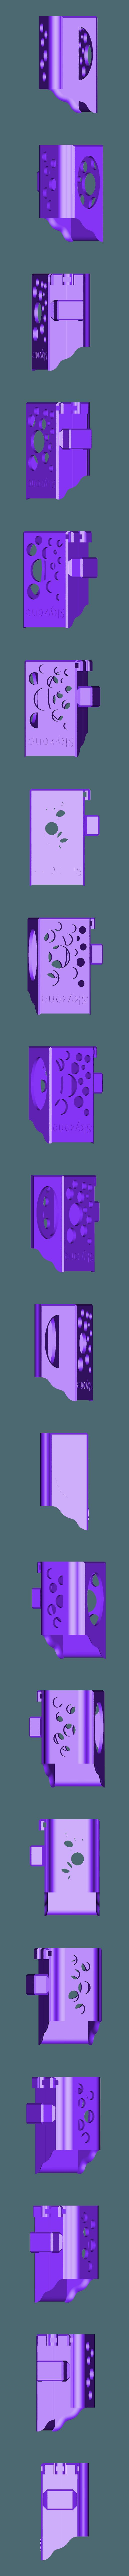 LiPo3S_holderV2.stl Download free STL file LiPo 3S holder for FPV goggles • 3D printer template, nik101968